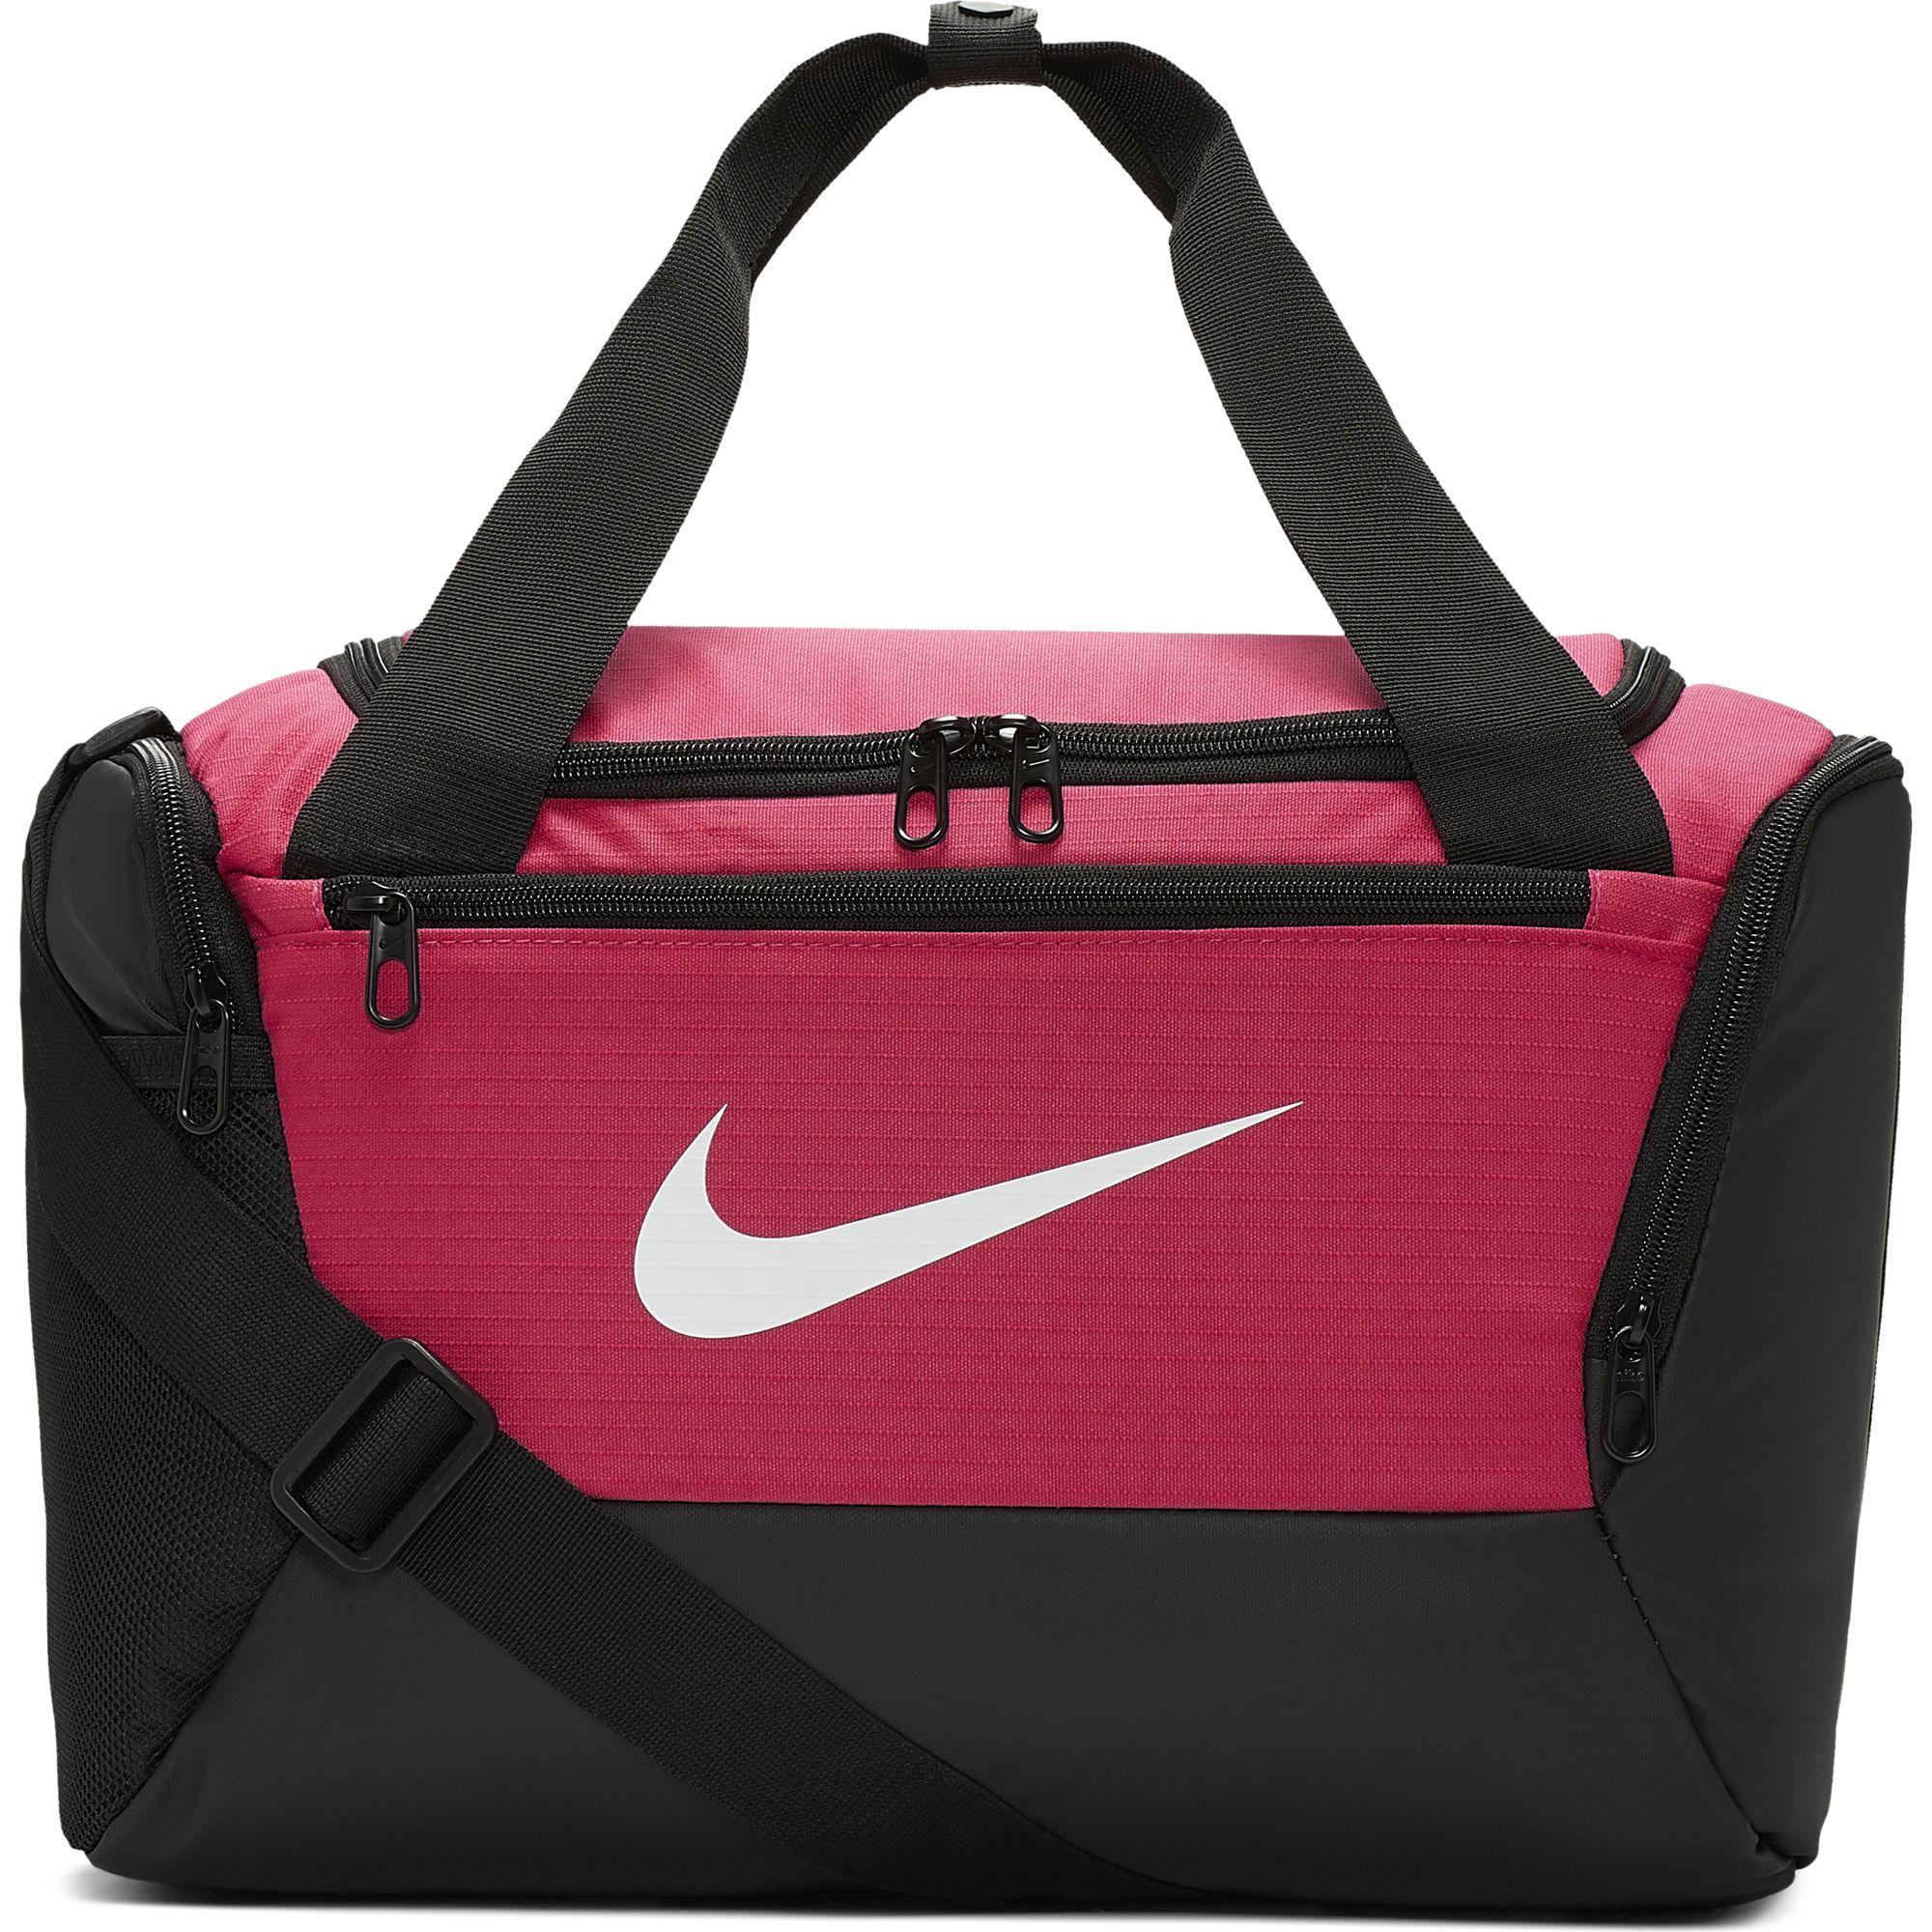 Brasilia X-Small Duffel Bag, Pink/Black, swatch